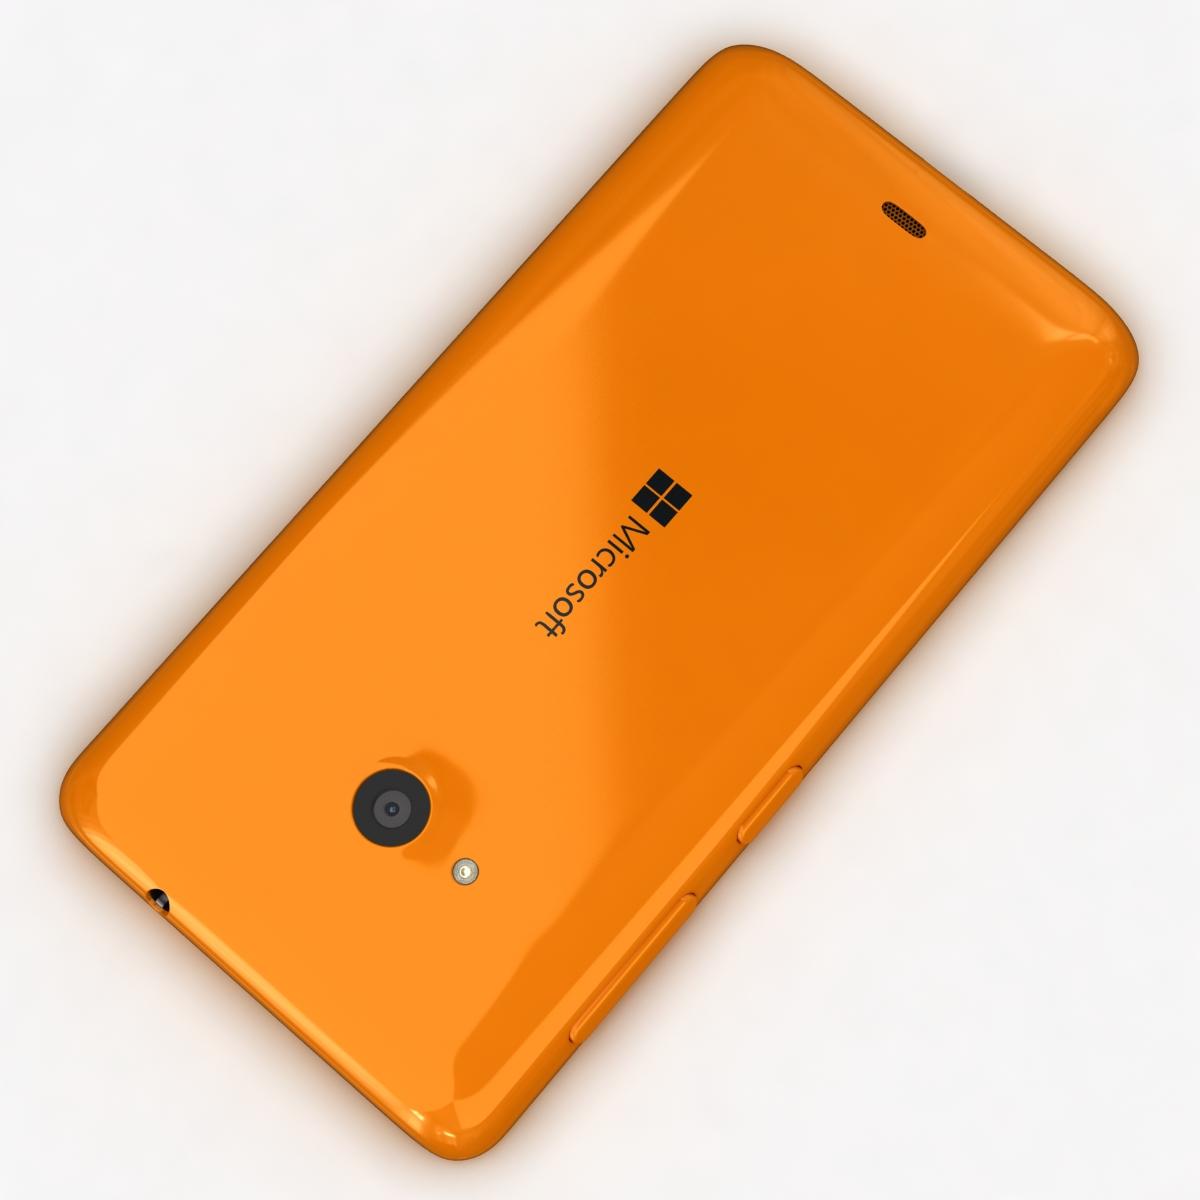 microsoft lumia 535 and dual sim orange 3d model 3ds max fbx c4d obj 204112